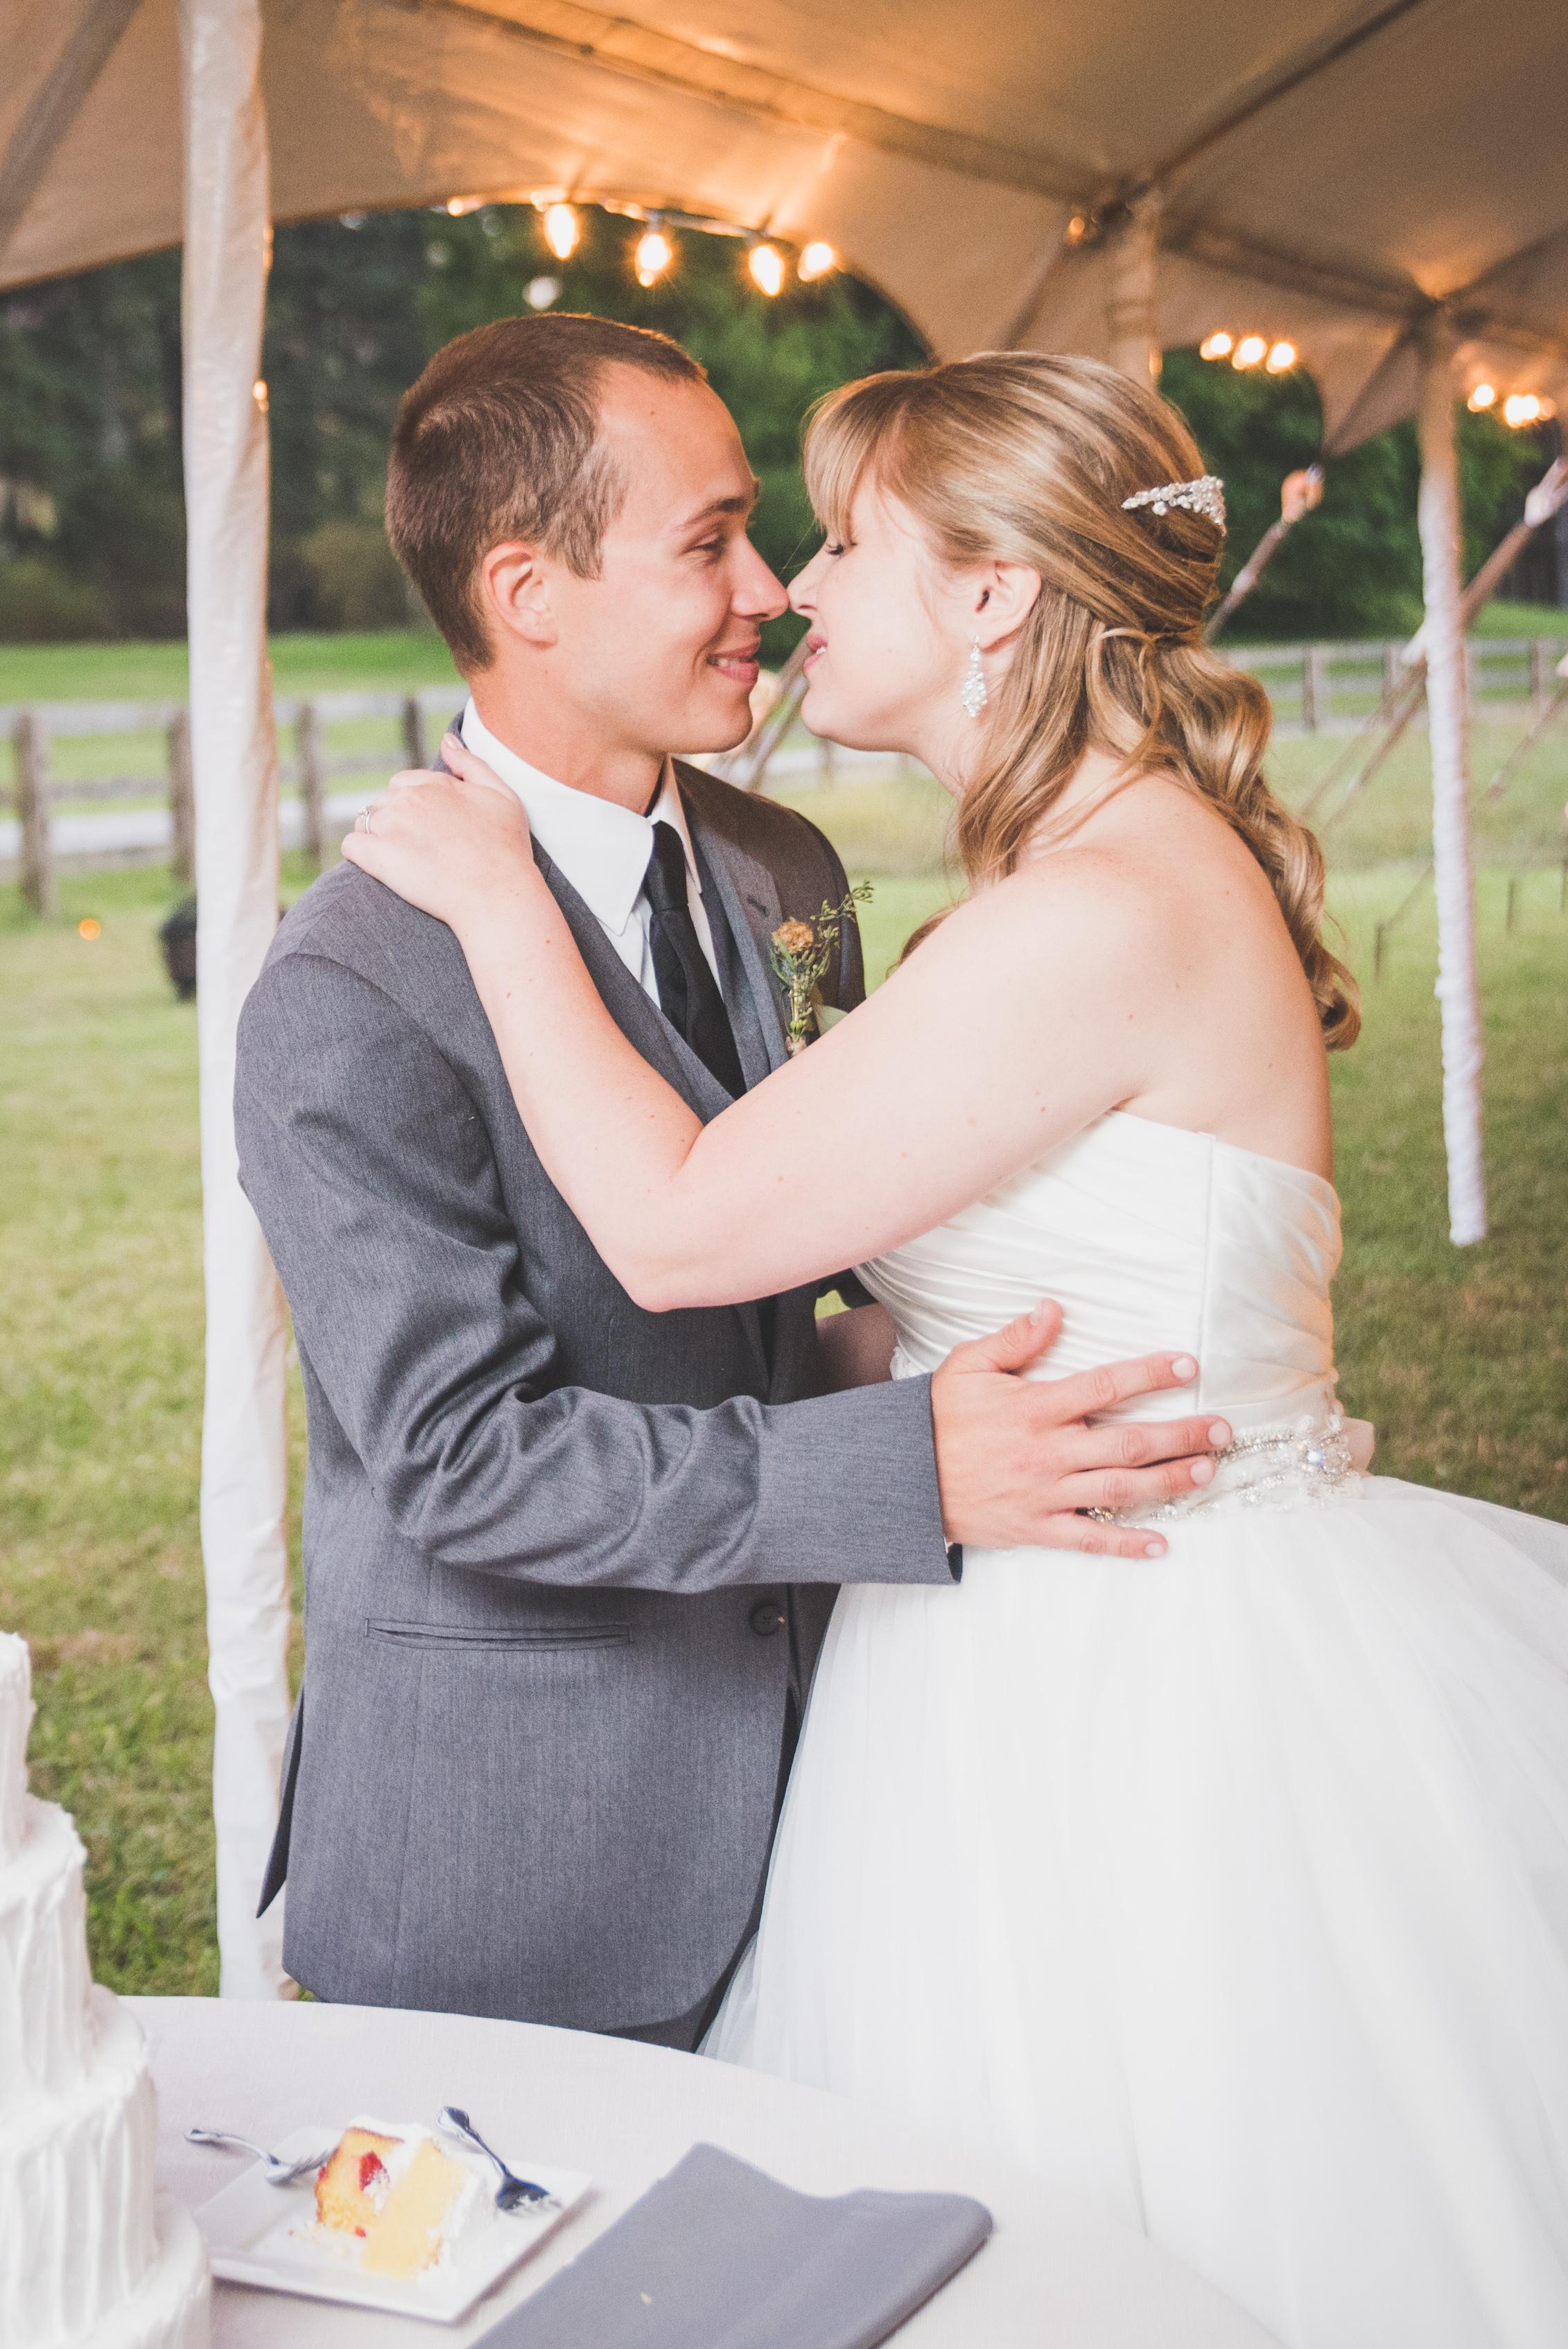 Big East Fork Retreat Nashville Wedding Photographer-59.jpg